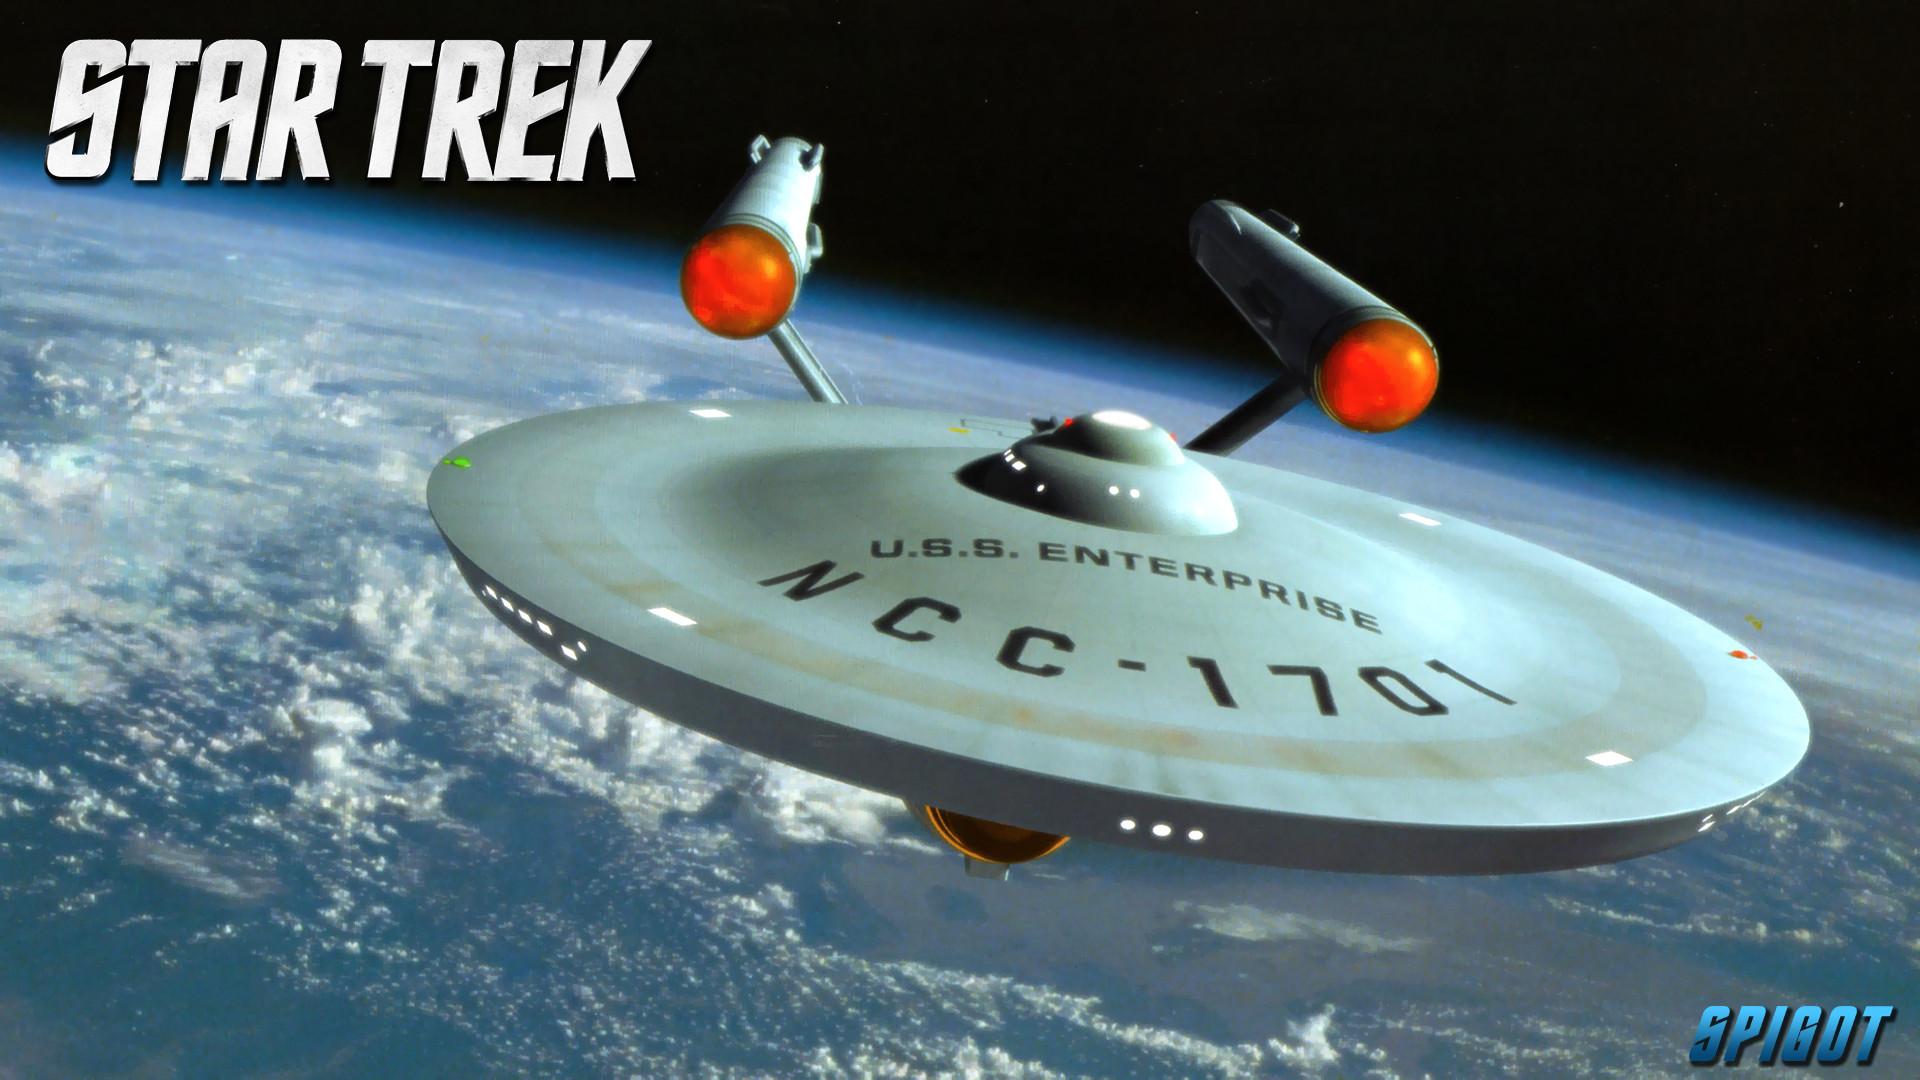 Star Trek Wallpaper Hd 34801 Full HD Wallpaper Desktop – Res .